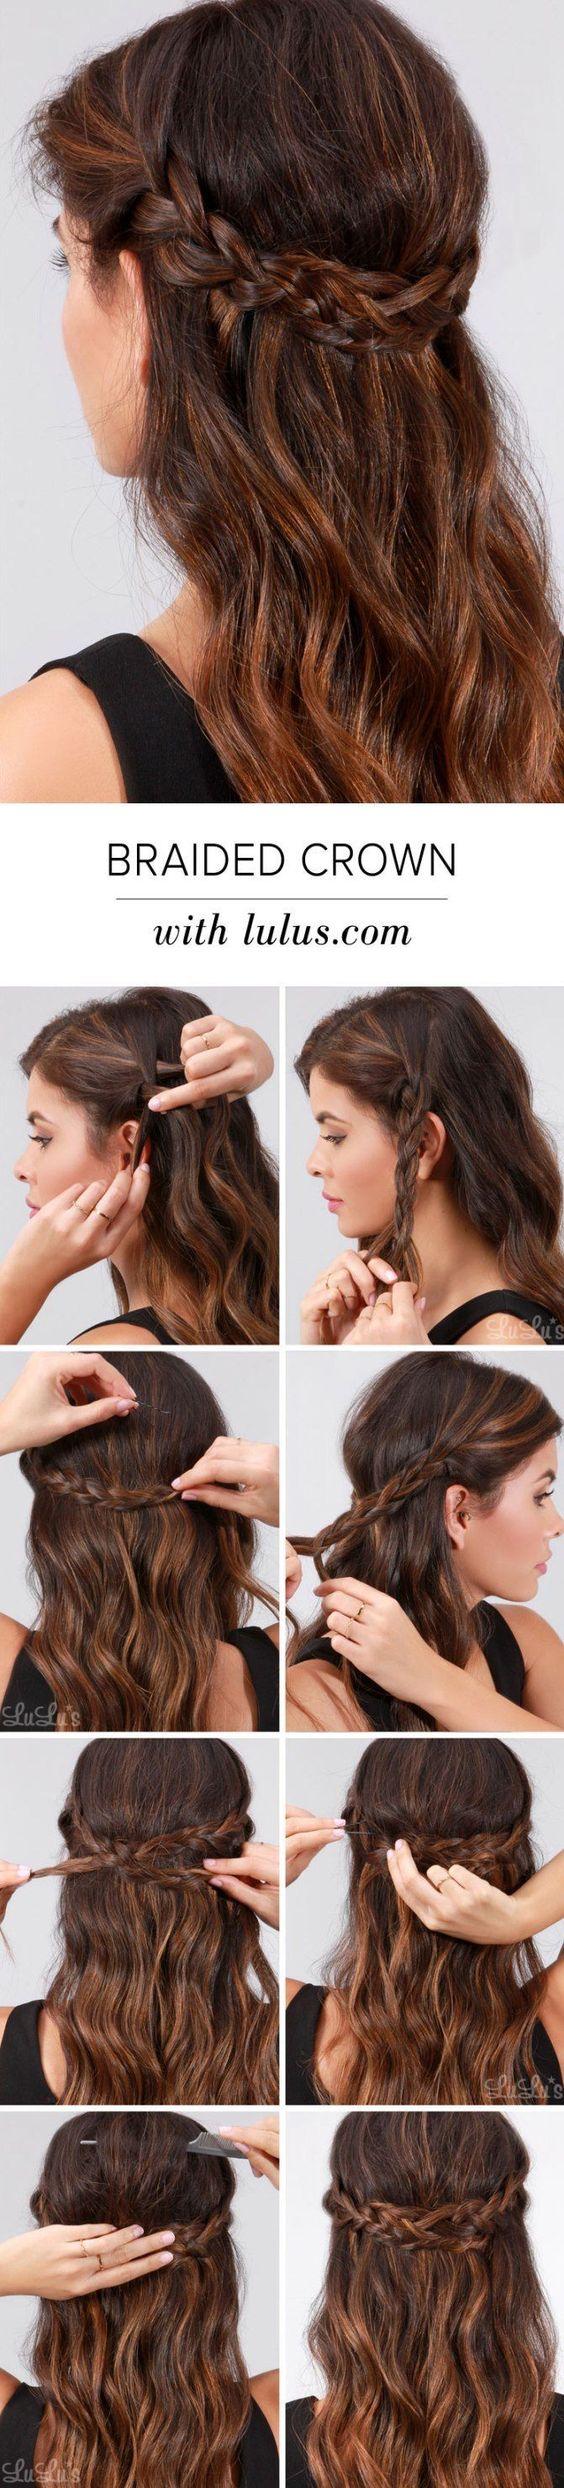 The best images about braids on pinterest crown braids braid